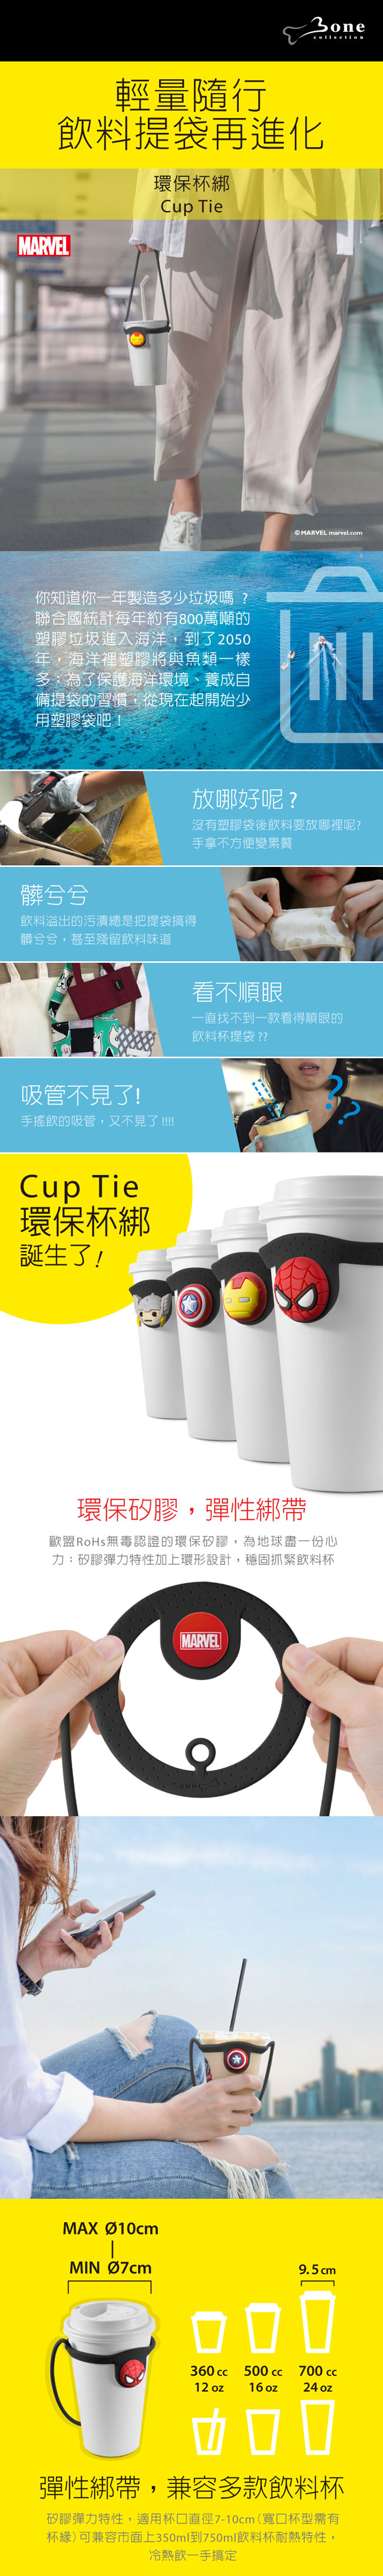 Bone | Cup Tie 環保矽膠飲料杯綁 - 漫威款